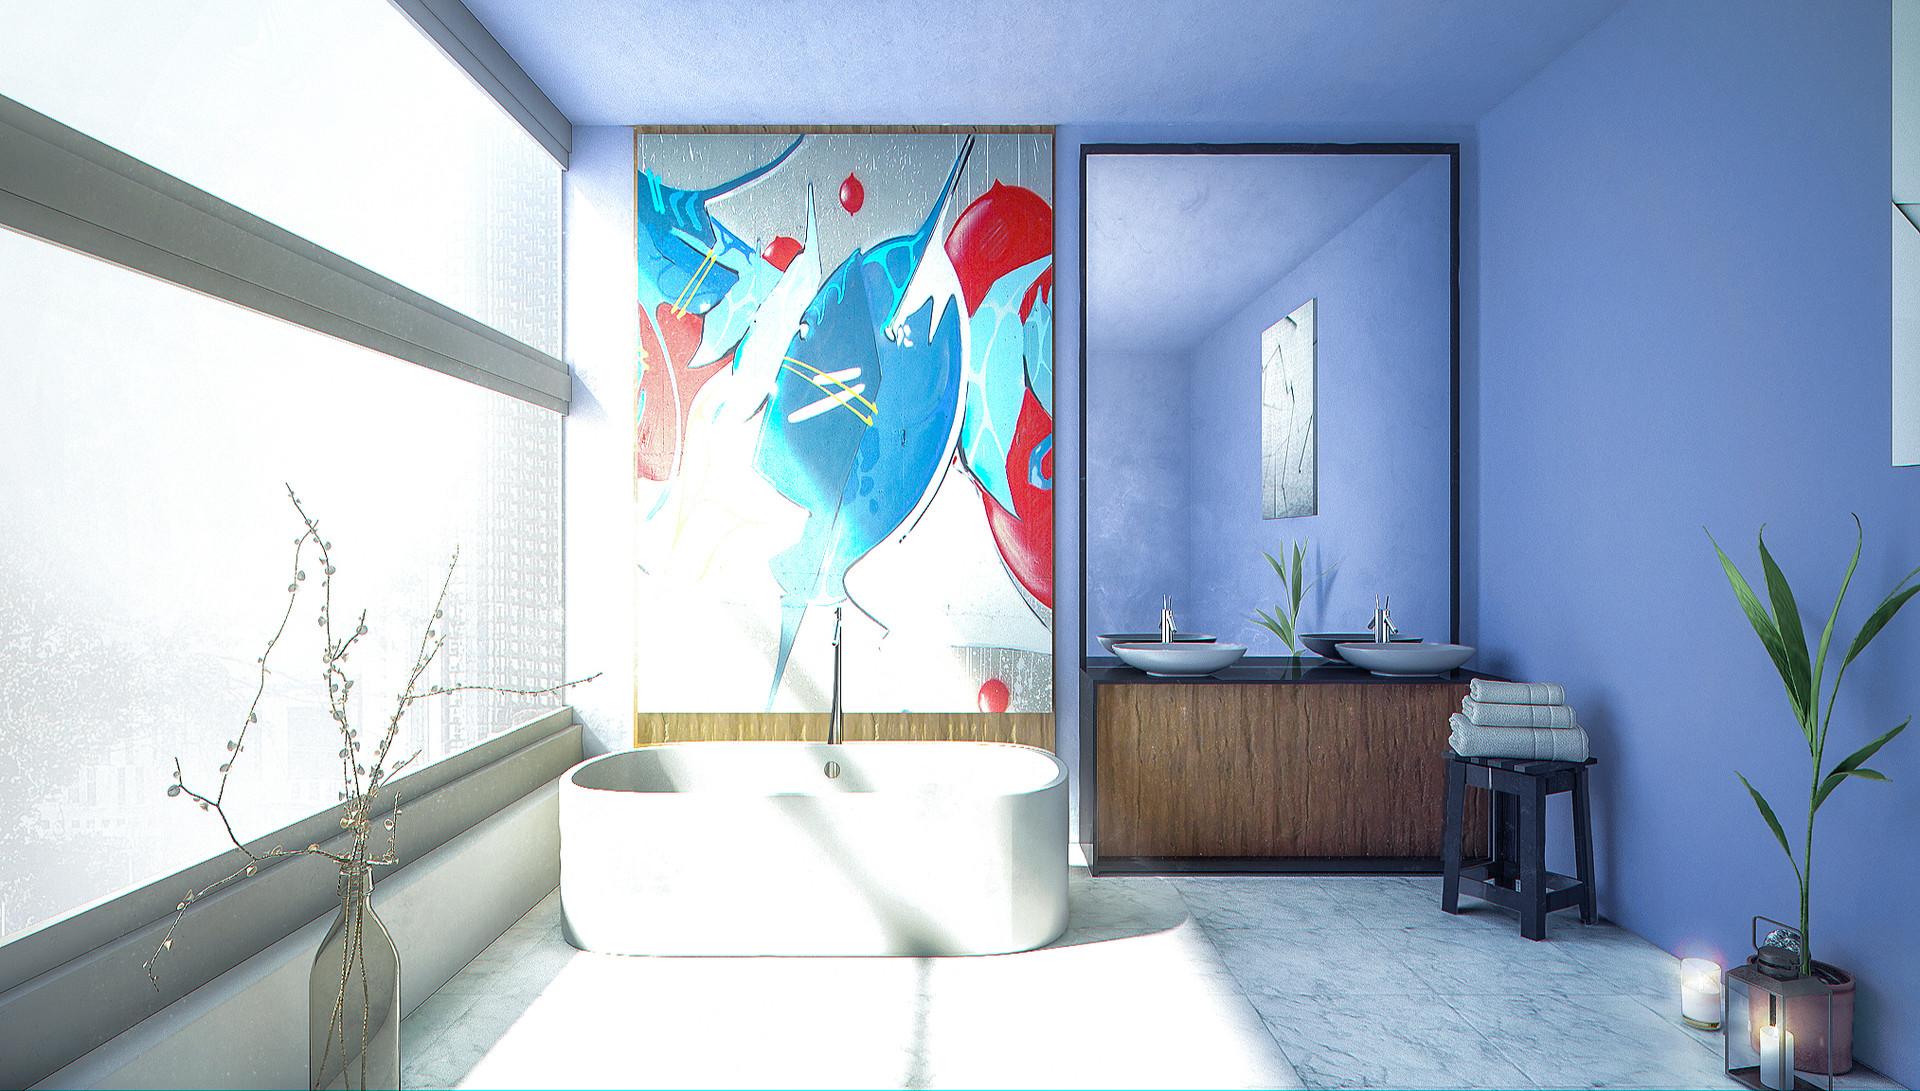 ArtStation - Modern Luxury Bathroom Render, Christian Tejada